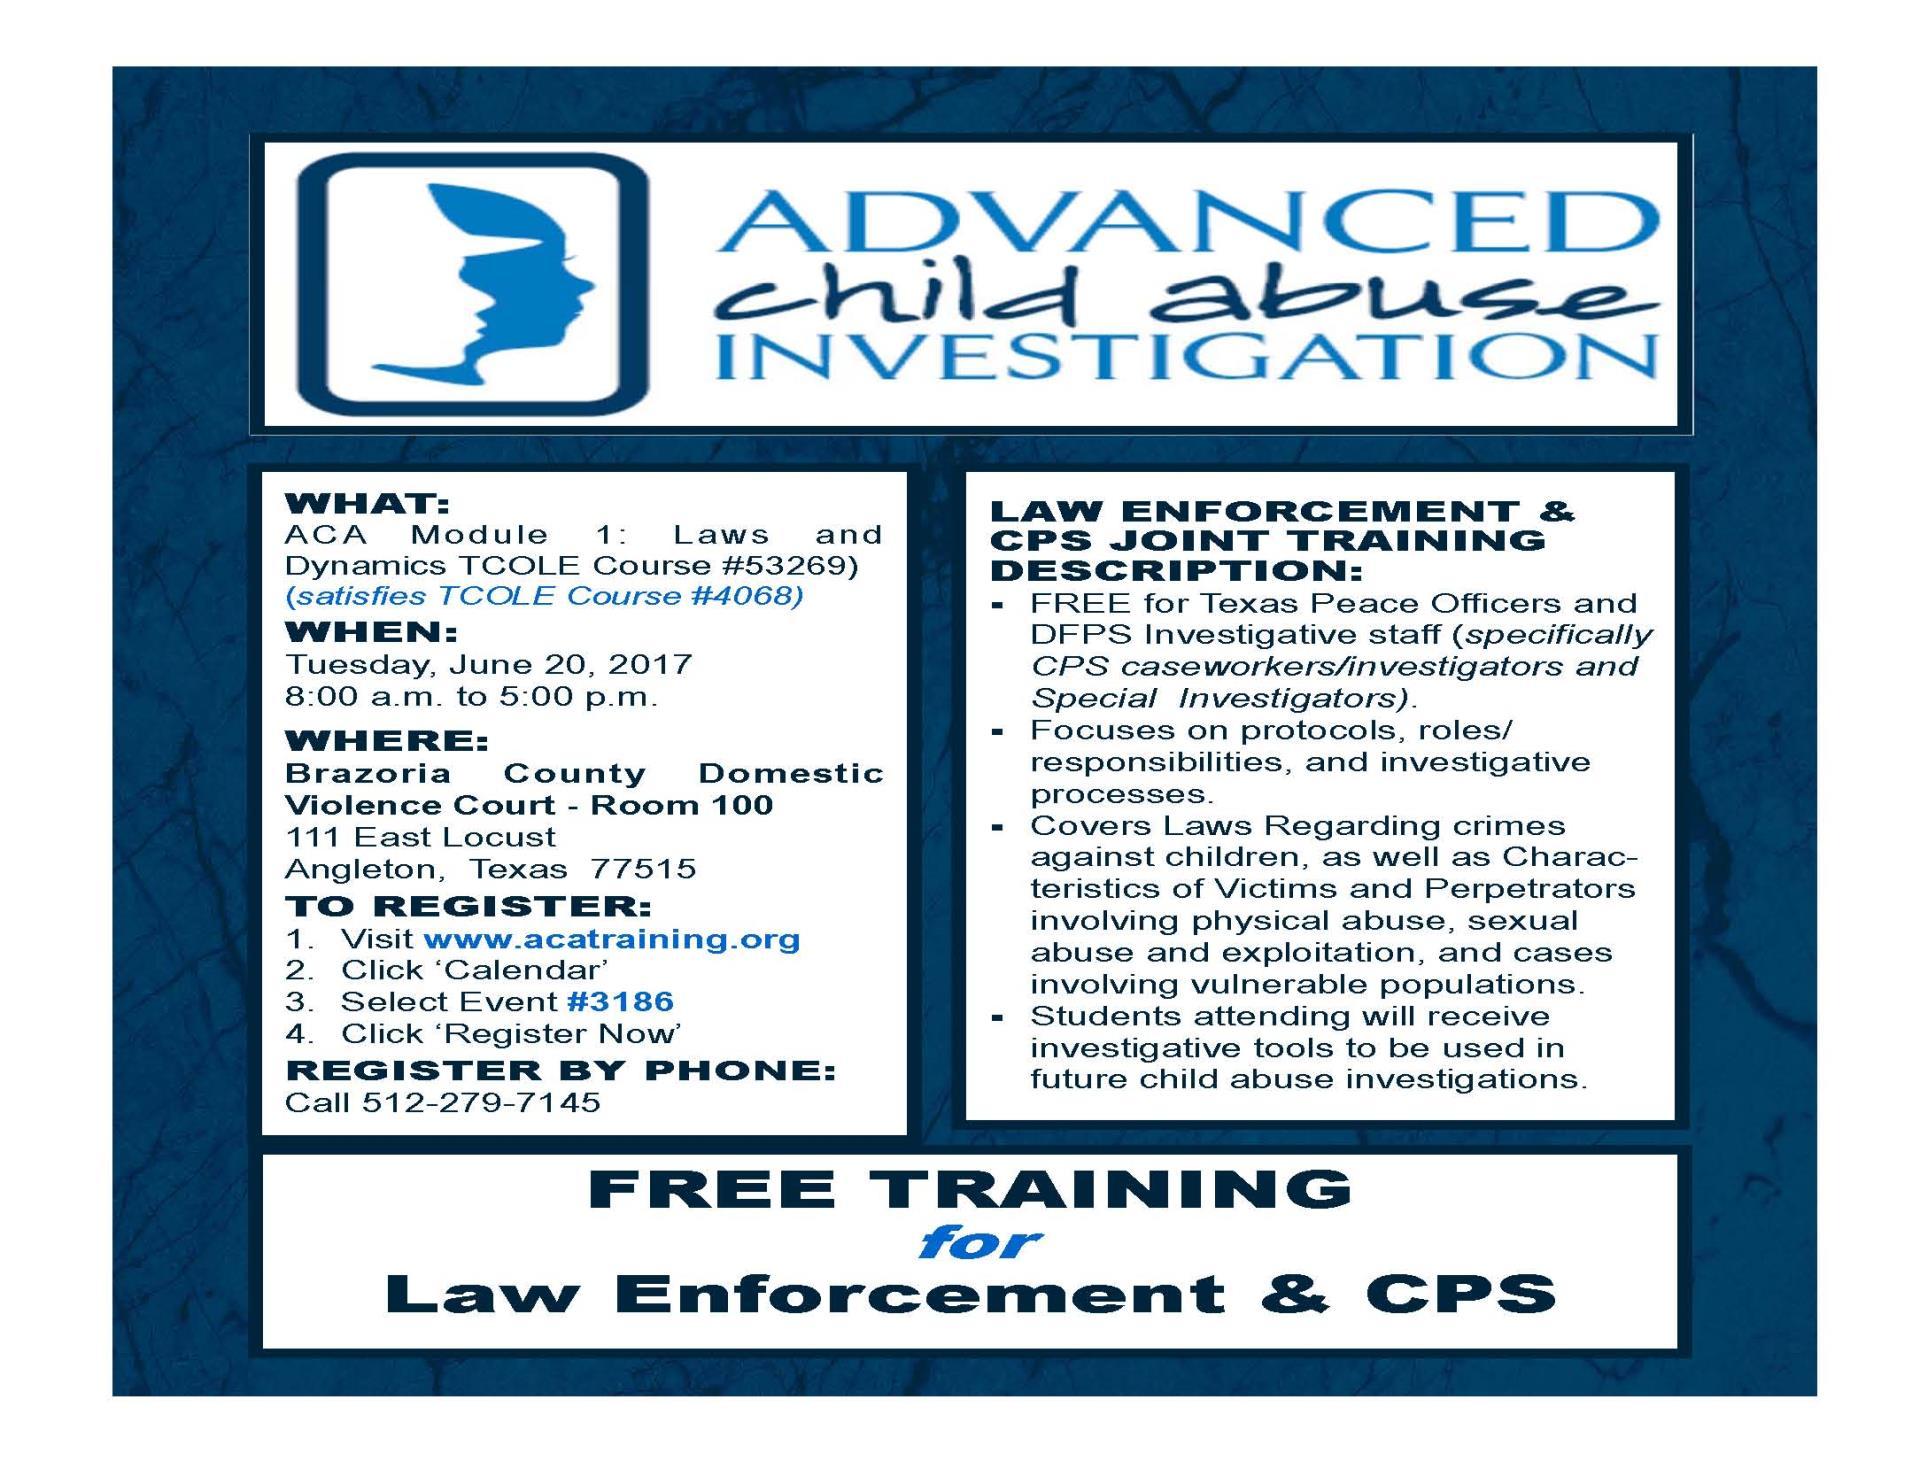 Advanced Child Abuse Investigation Training | County Calendar